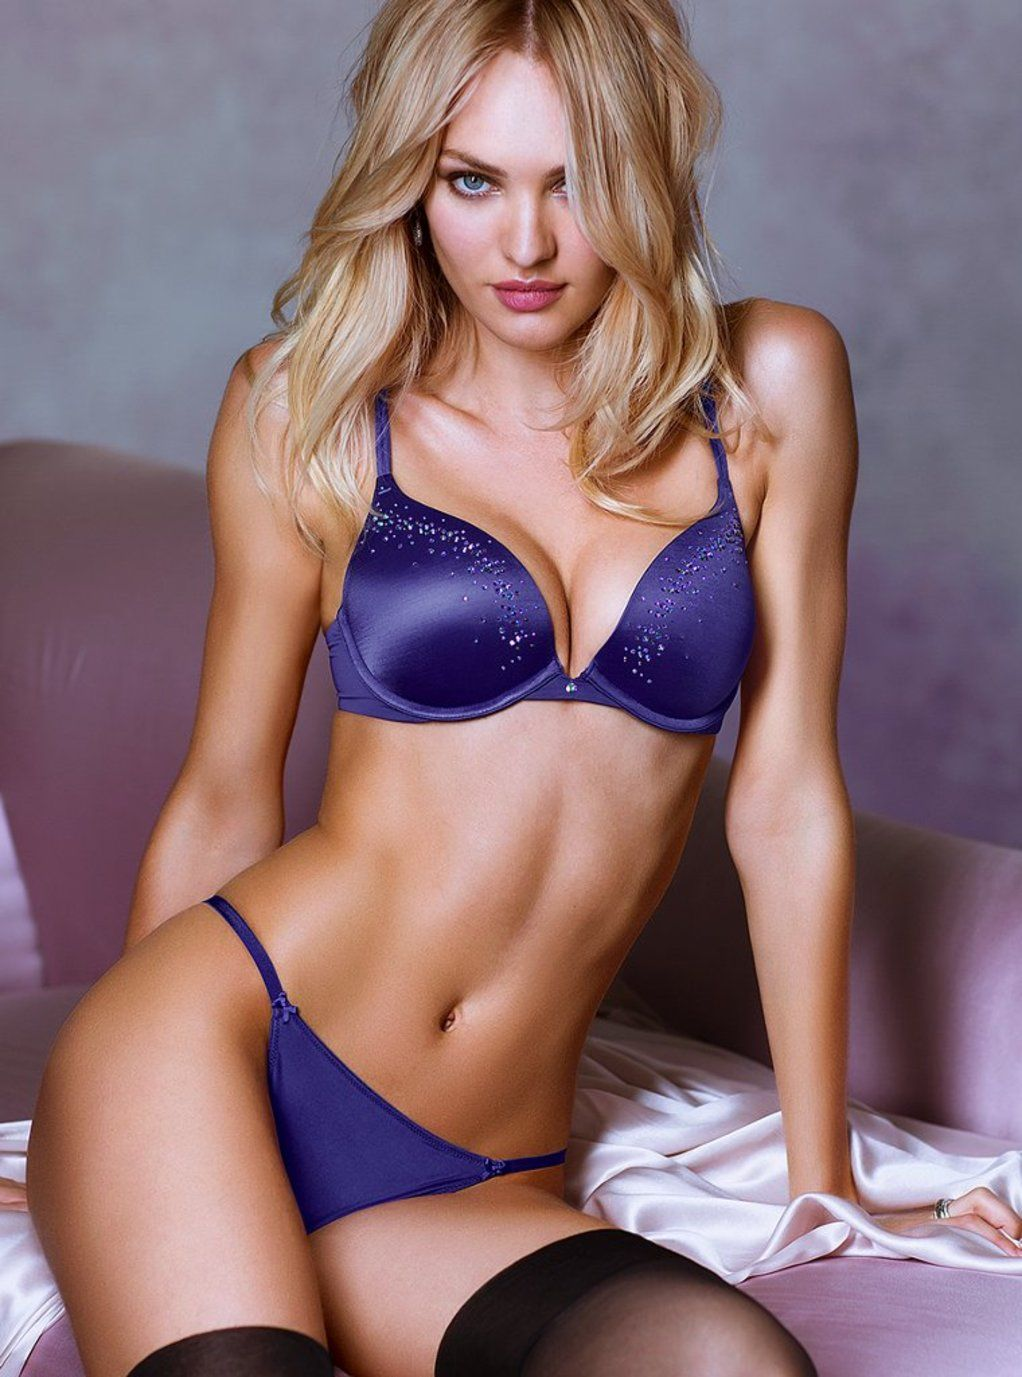 Victorias Secret Sexy Hot Lingerie Models Doutzen Kroes, Erin Heatherton and Candice Swanepoel